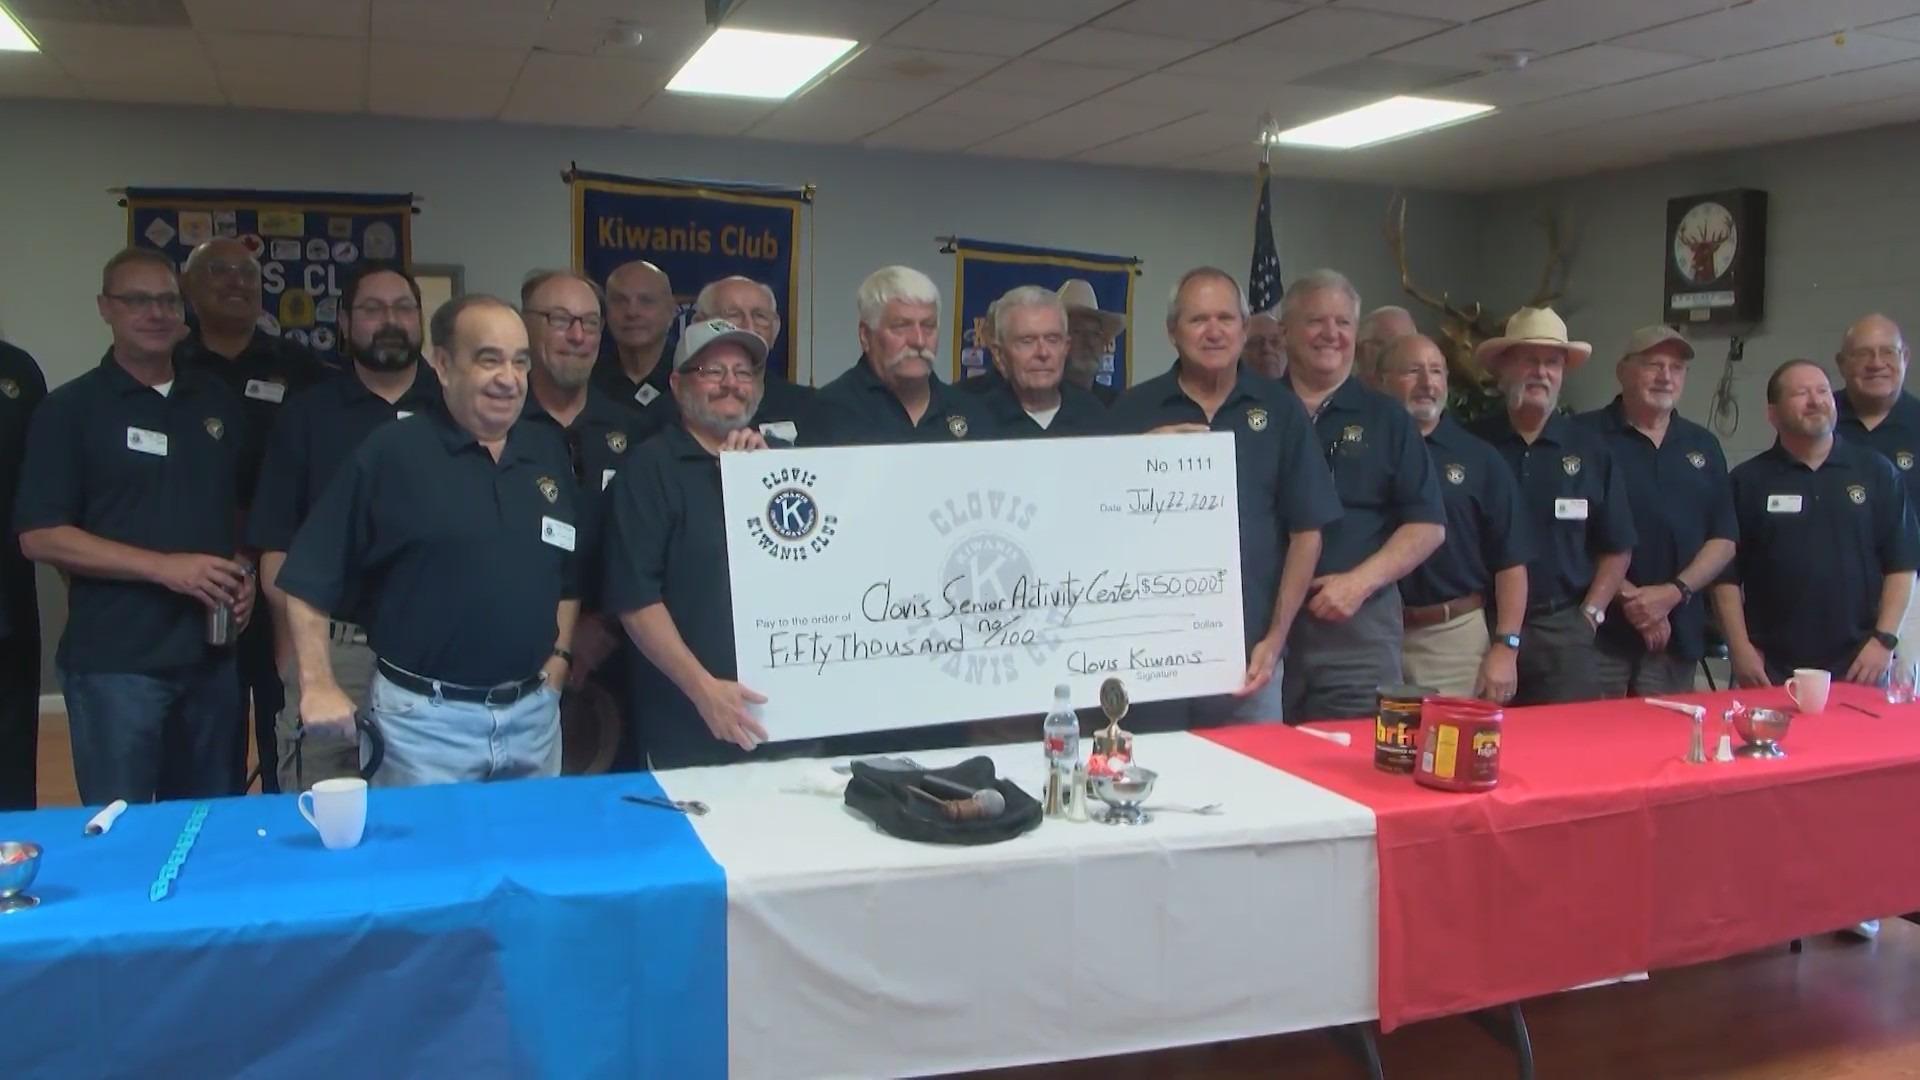 Big donation gives new life to Clovis senior center construction